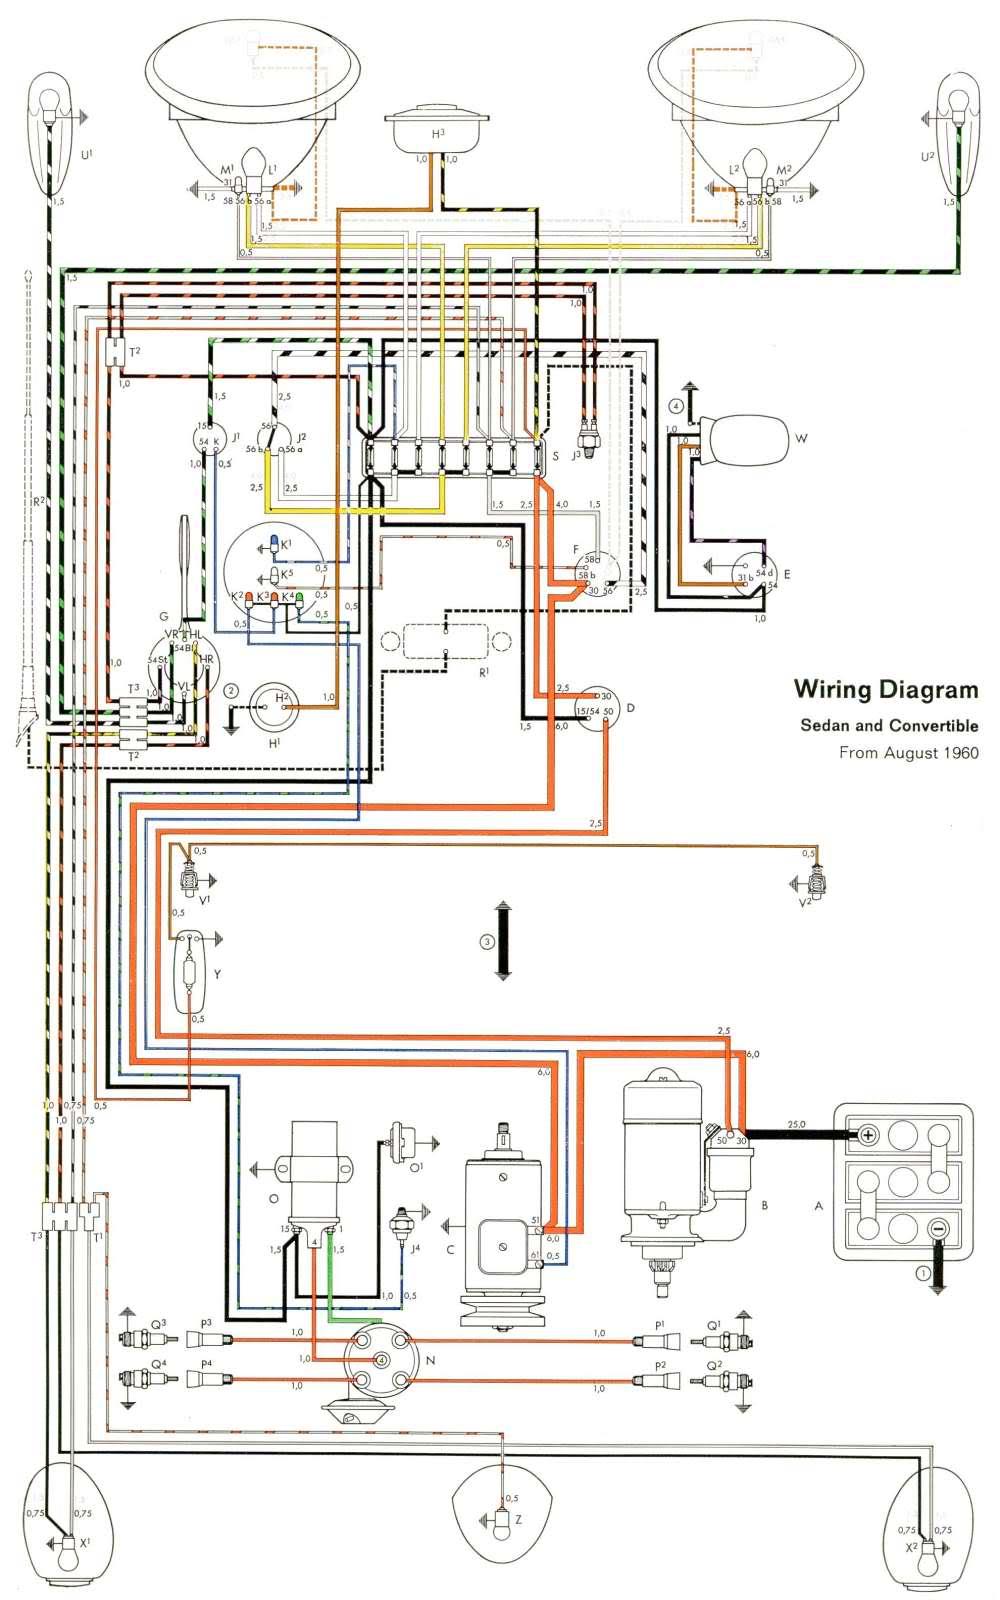 Esquema Eletrico on 67 Corvette Headlight Motor Wiring Diagram